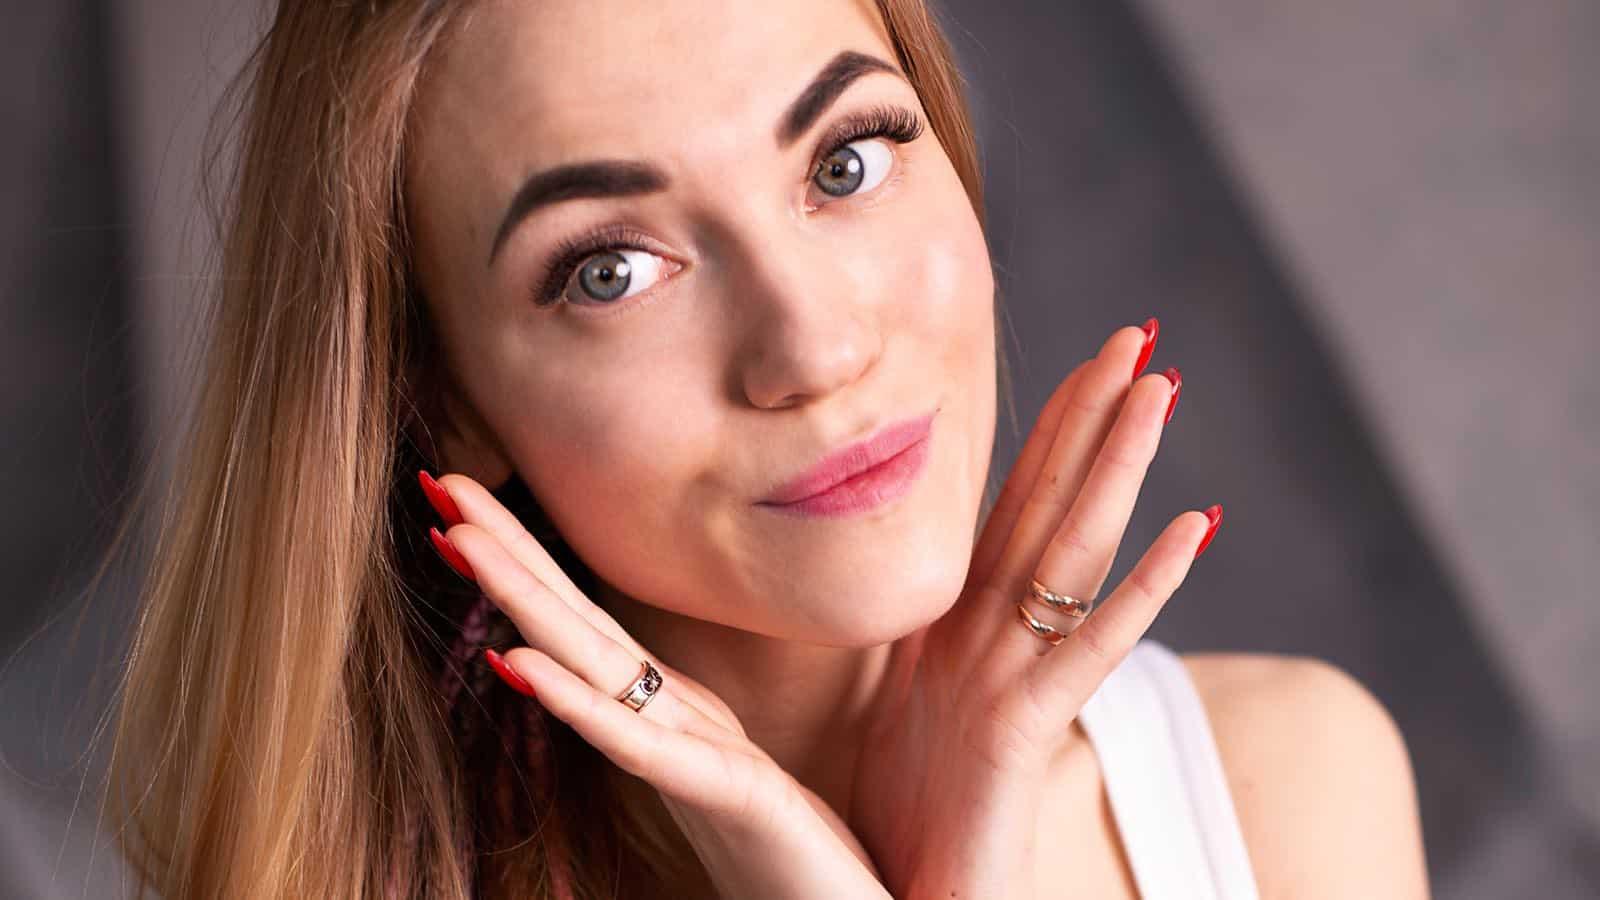 Nägel feilen- Fingernägel und Fußnägel richtig feilen | Anleitung